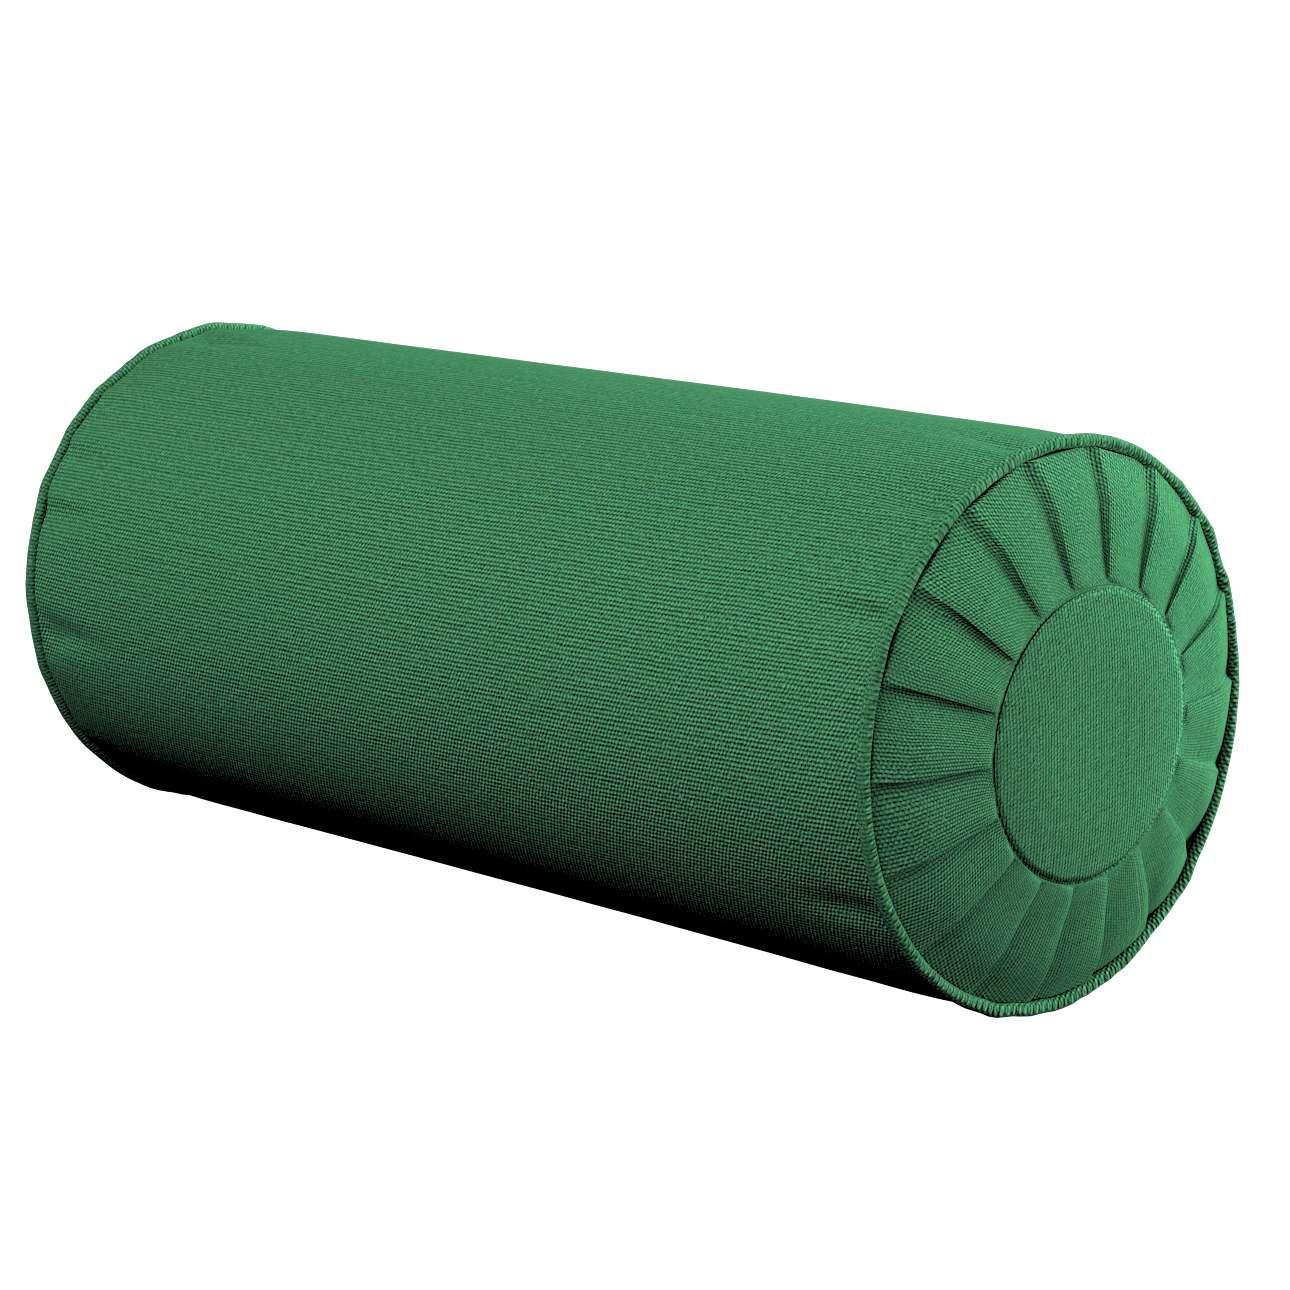 Nackenrolle in Grün